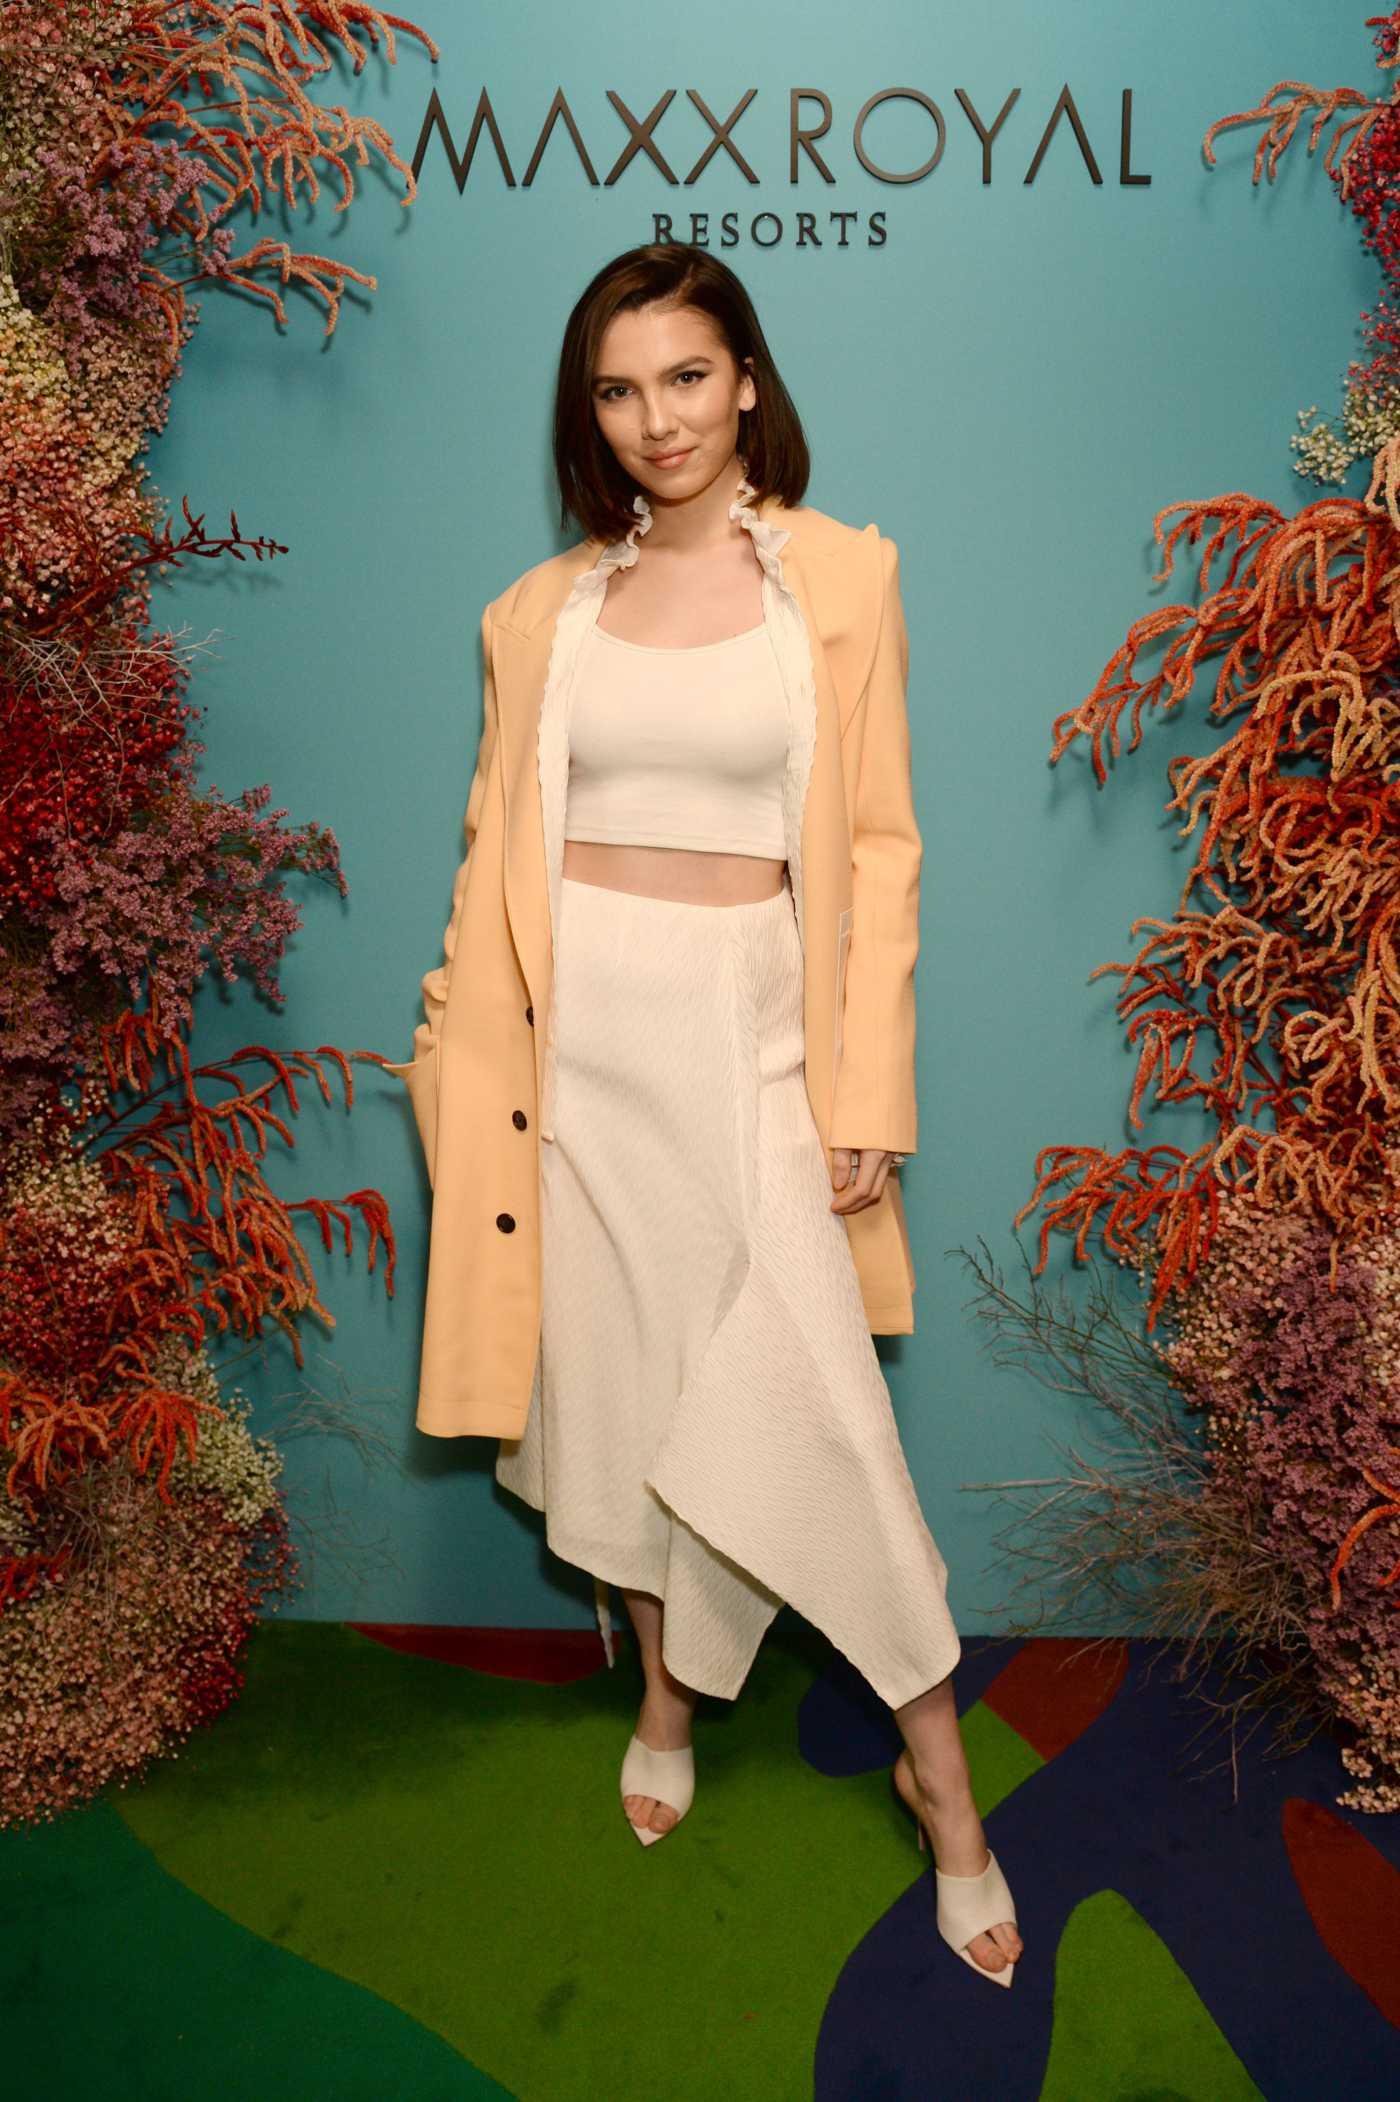 Maya Henry Attends the Natalia Vodianova x Maxx Resorts Party in London 02/17/2020